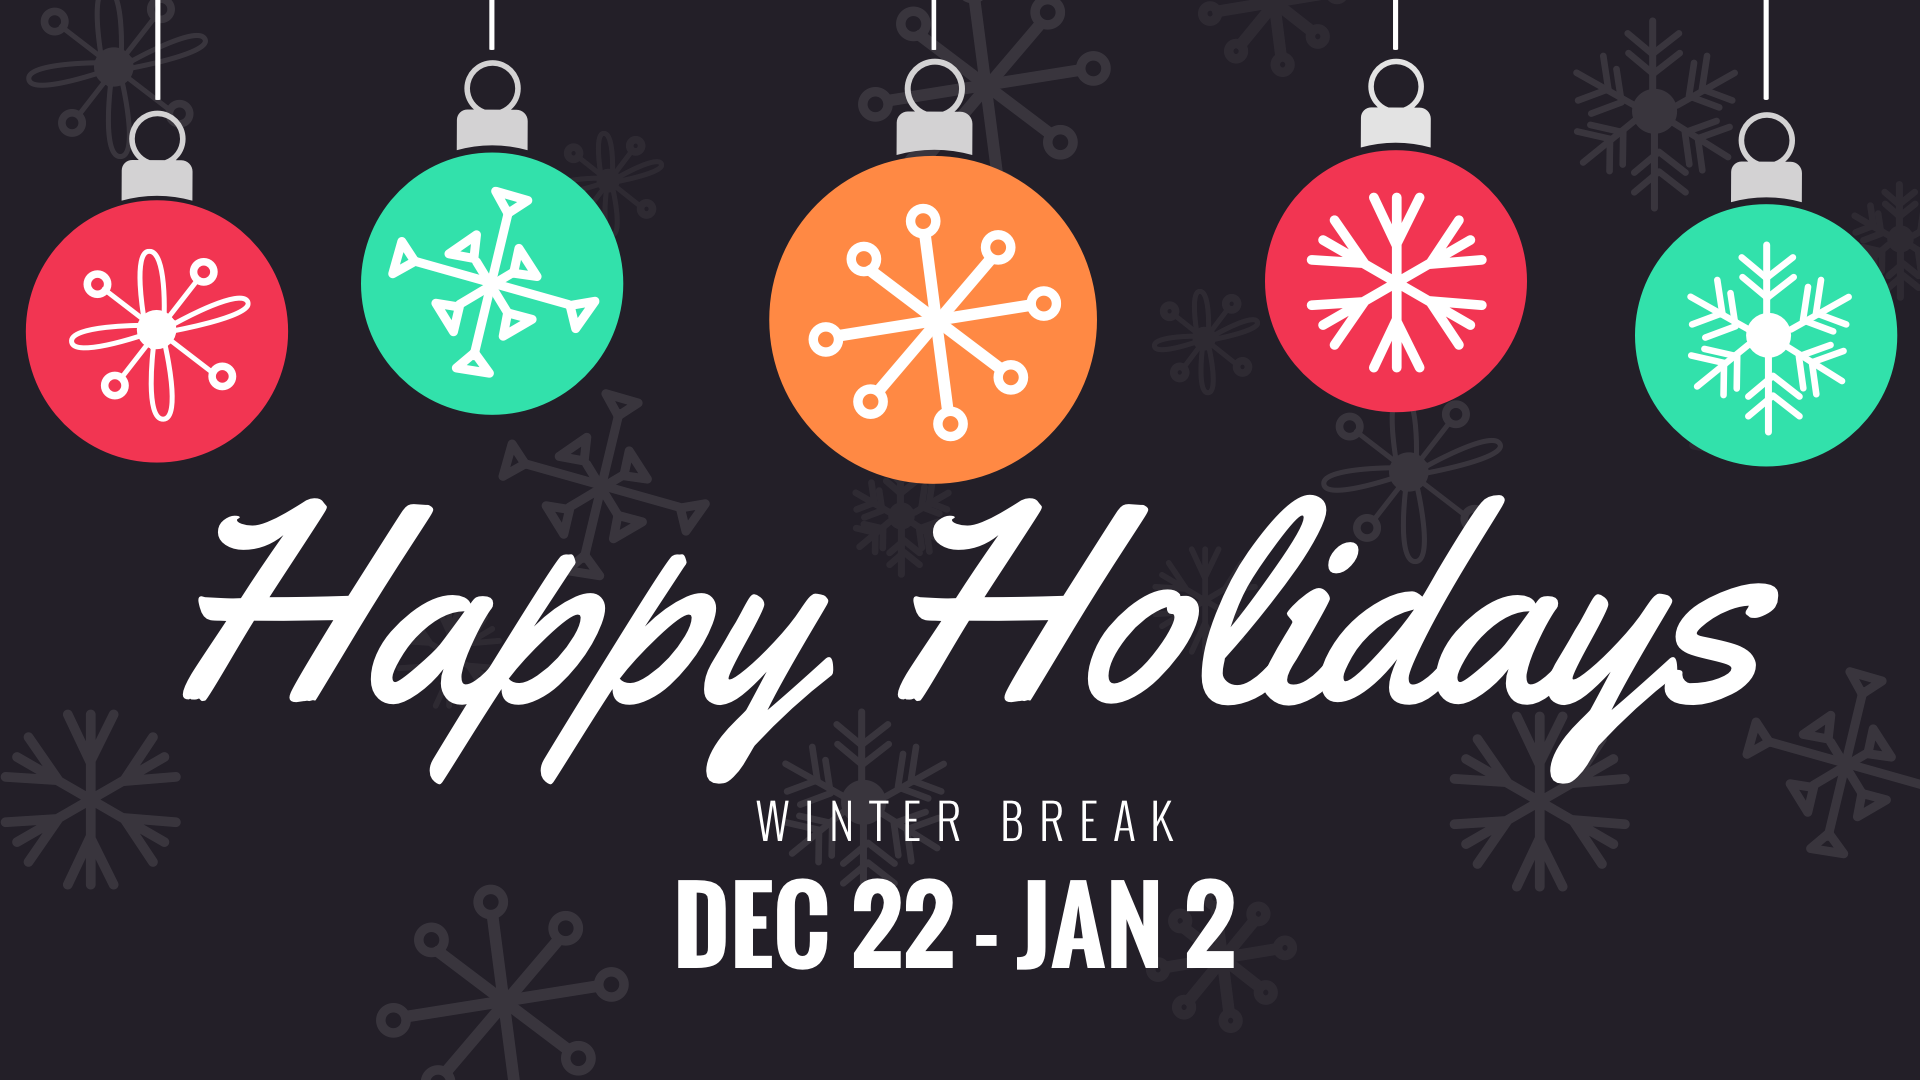 Happy Holidays 02 Digital Signage